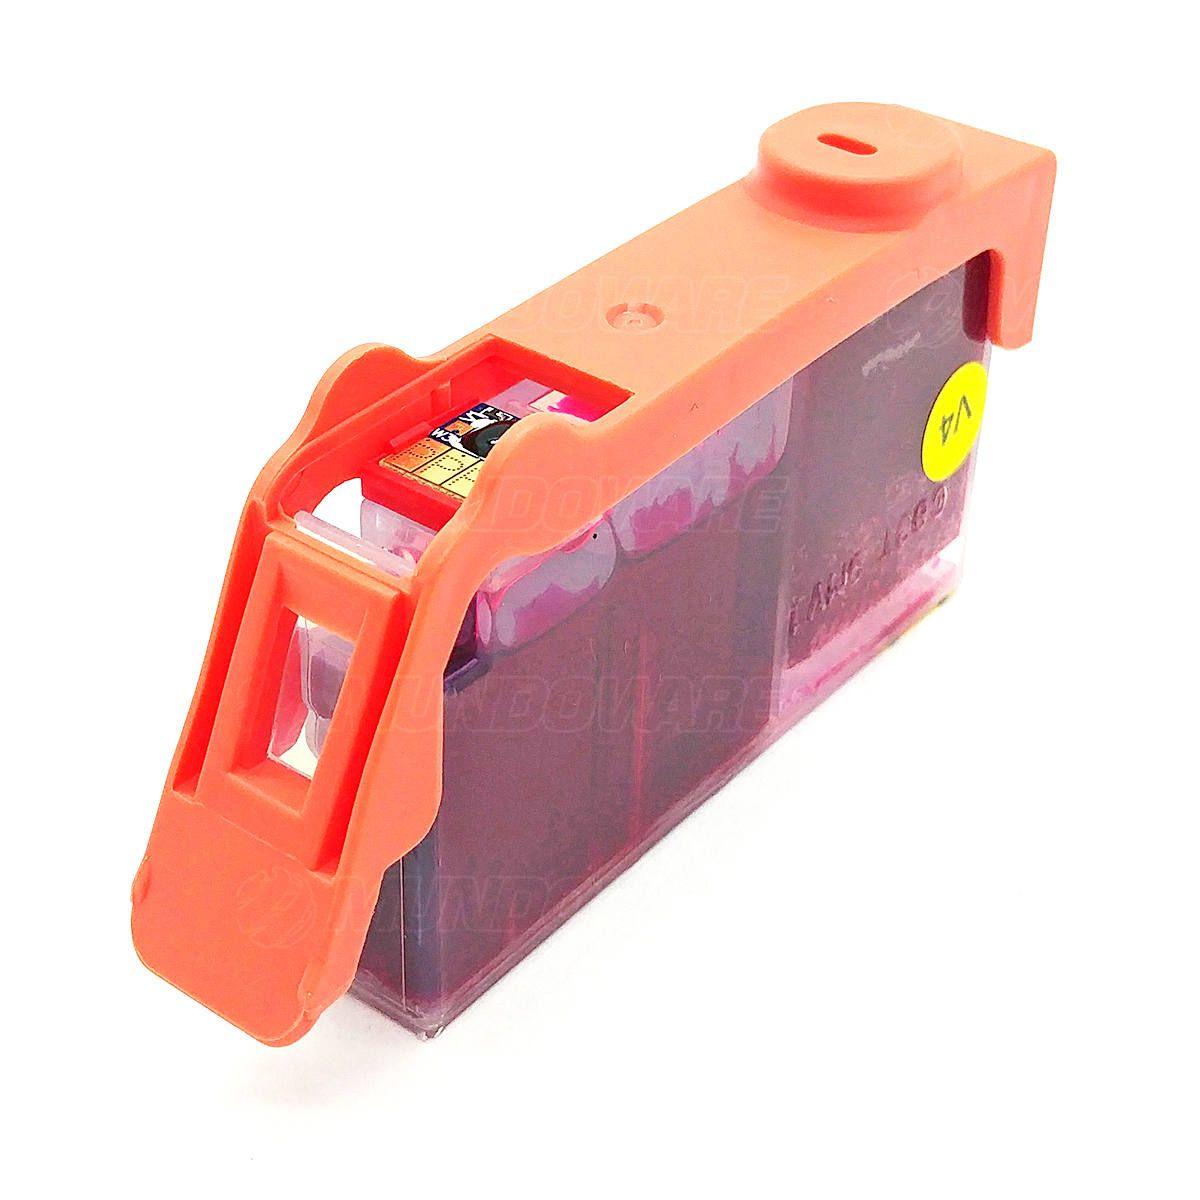 Compatível: Cartucho de Tinta 935xl 935 xl para Impressora HP Pro 6230 6830 / Magenta / 13ml